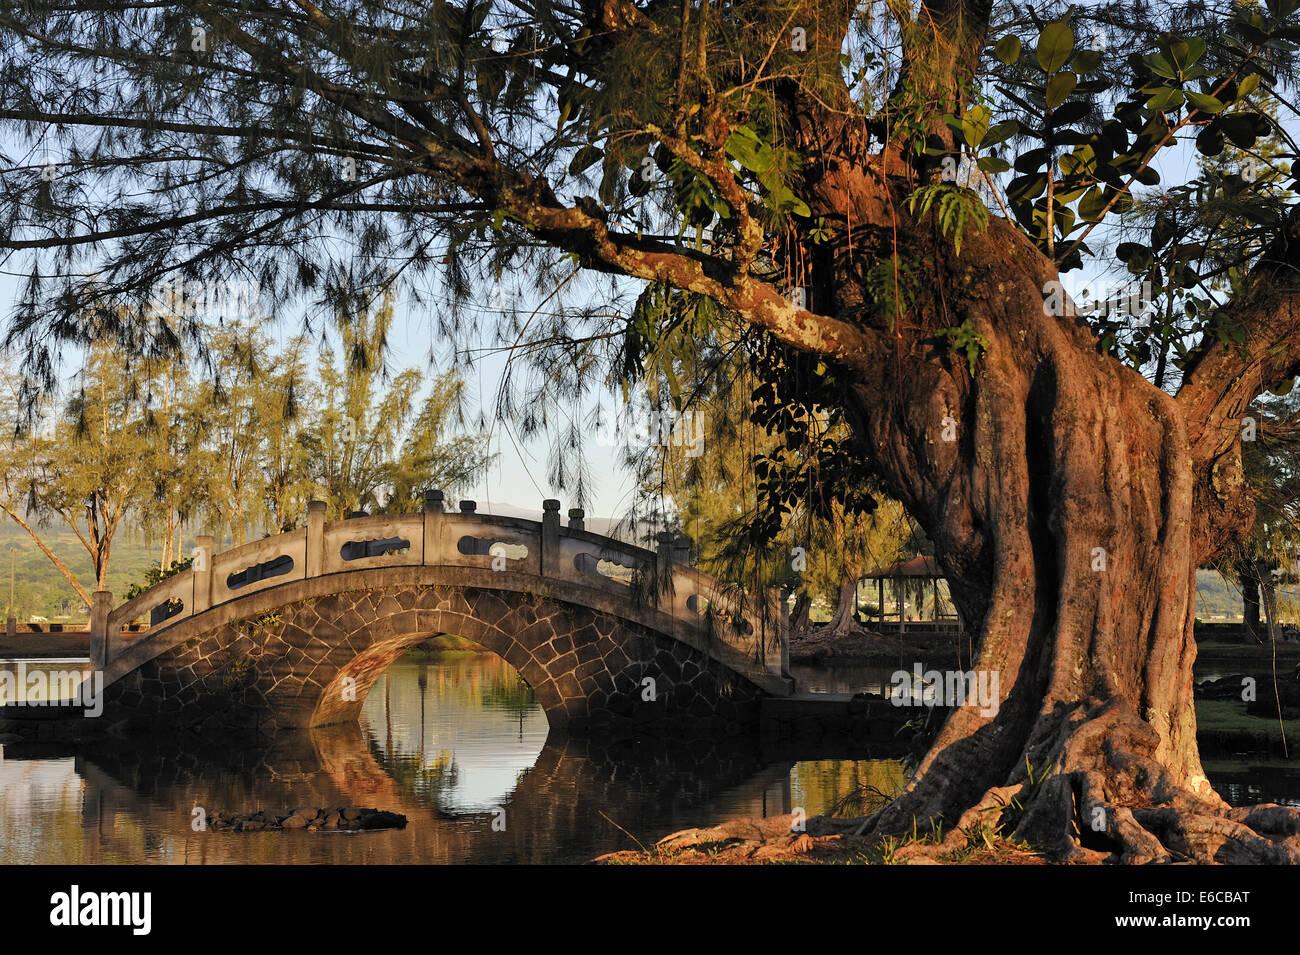 Japanese Garden, Hilo, Big Island, Hawaii Islands, USA - Stock Image